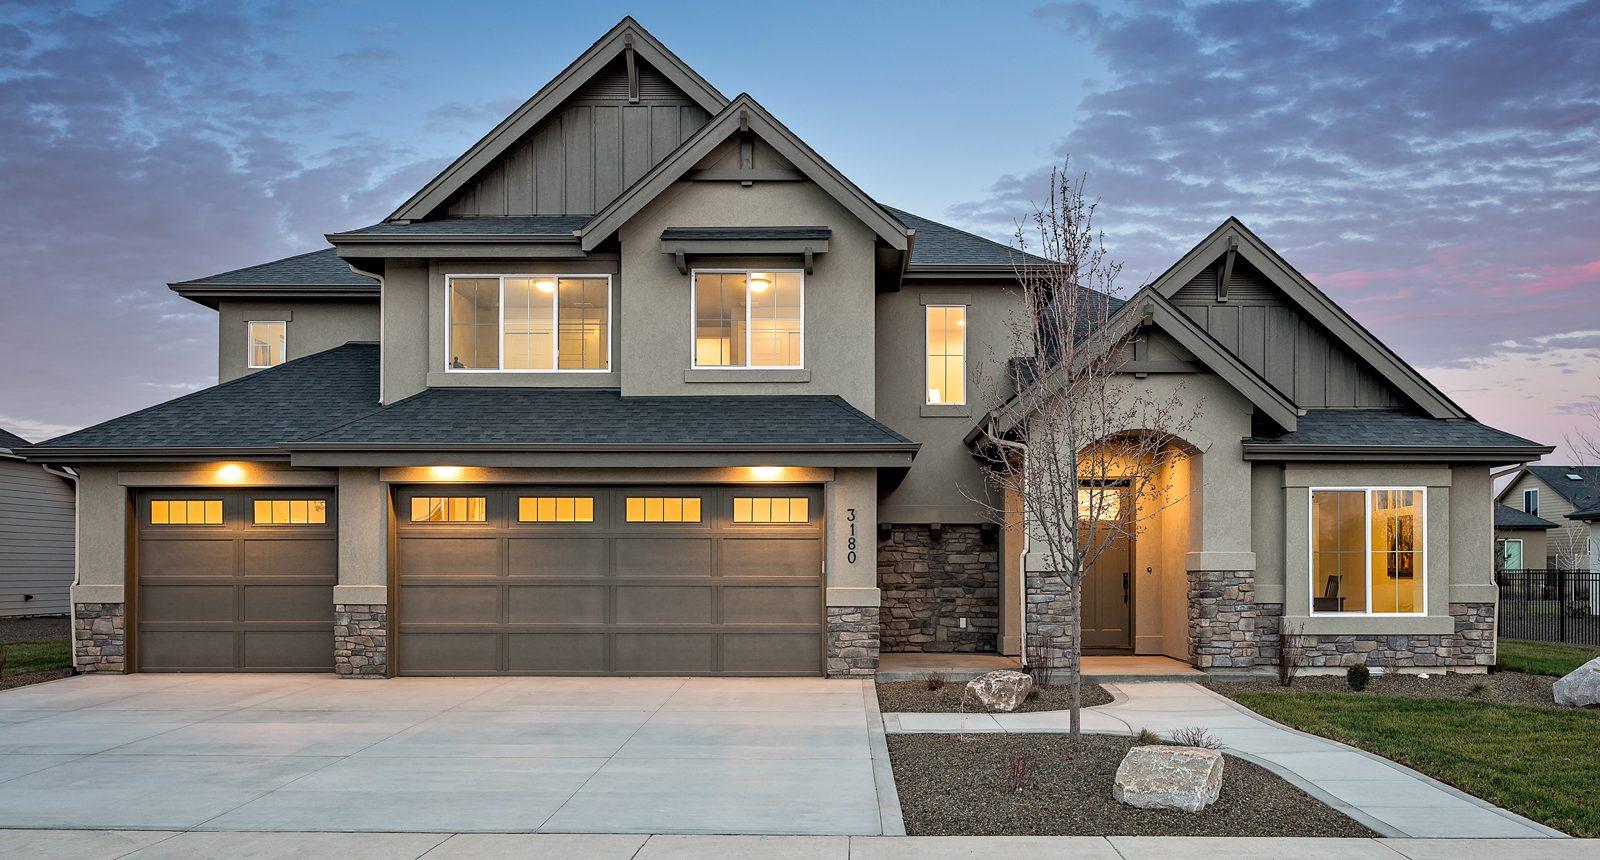 Boise Home Inspection